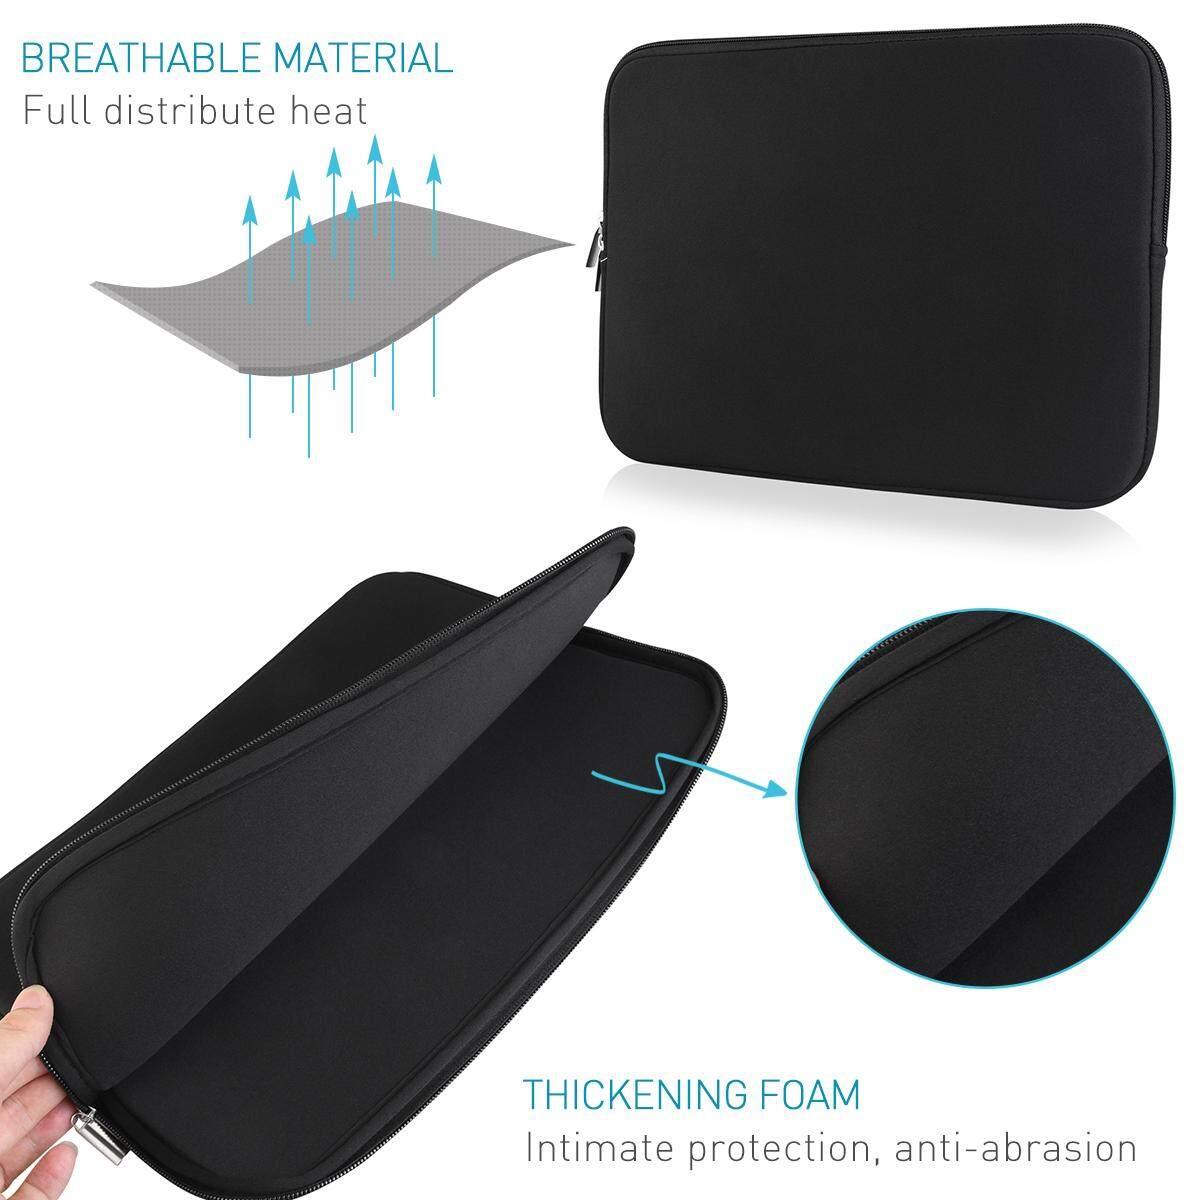 Laptop Sleeve Case Membawa Casing untuk 13 Inch Macbook Mac Air/Pro/Retina (Hitam)-Intl